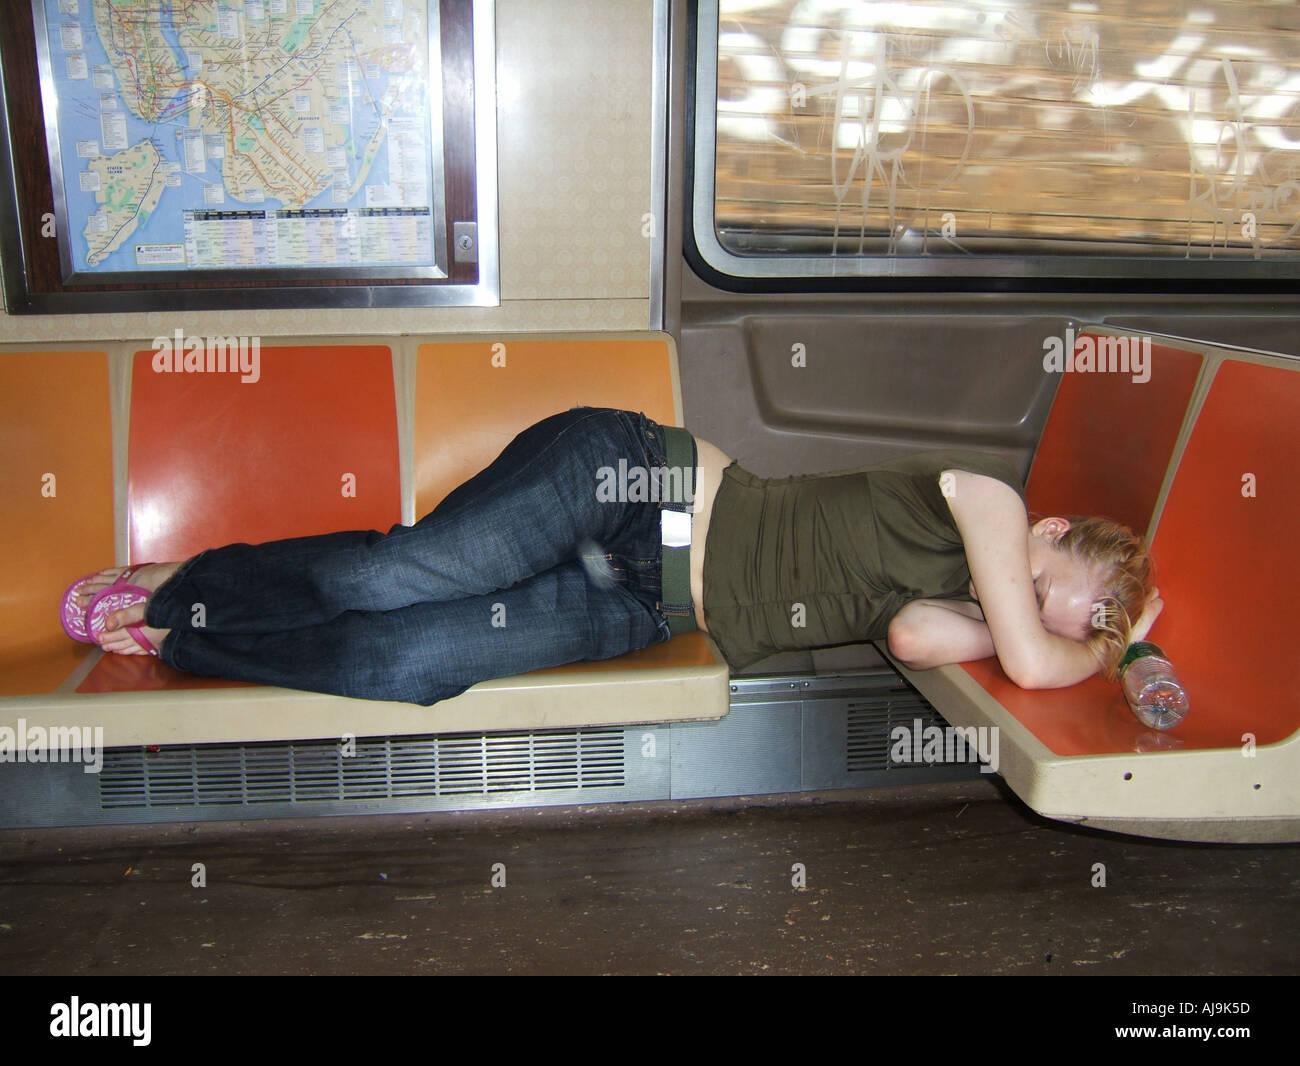 Girl lying on seat below subway map New York subway train manhattan USA Stock Photo